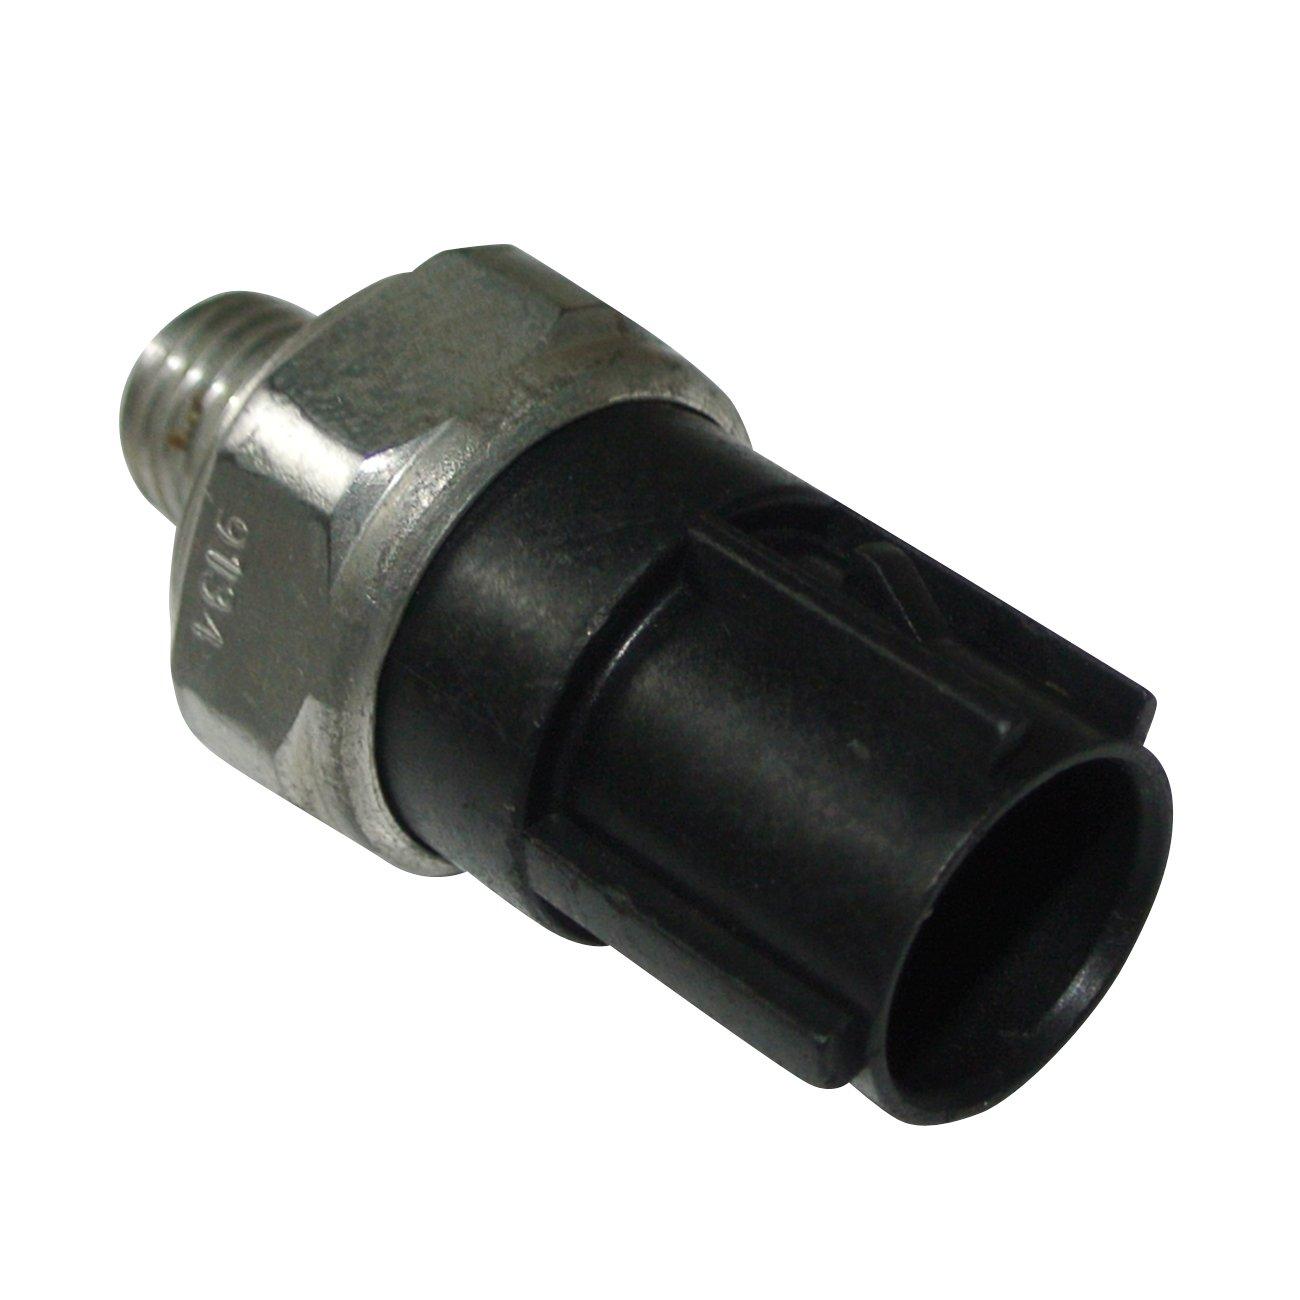 JRL Oil Pressure Switch 37250-PNE-G01 For 2003-2012 Honda Accord Civic Acura RDX RSX